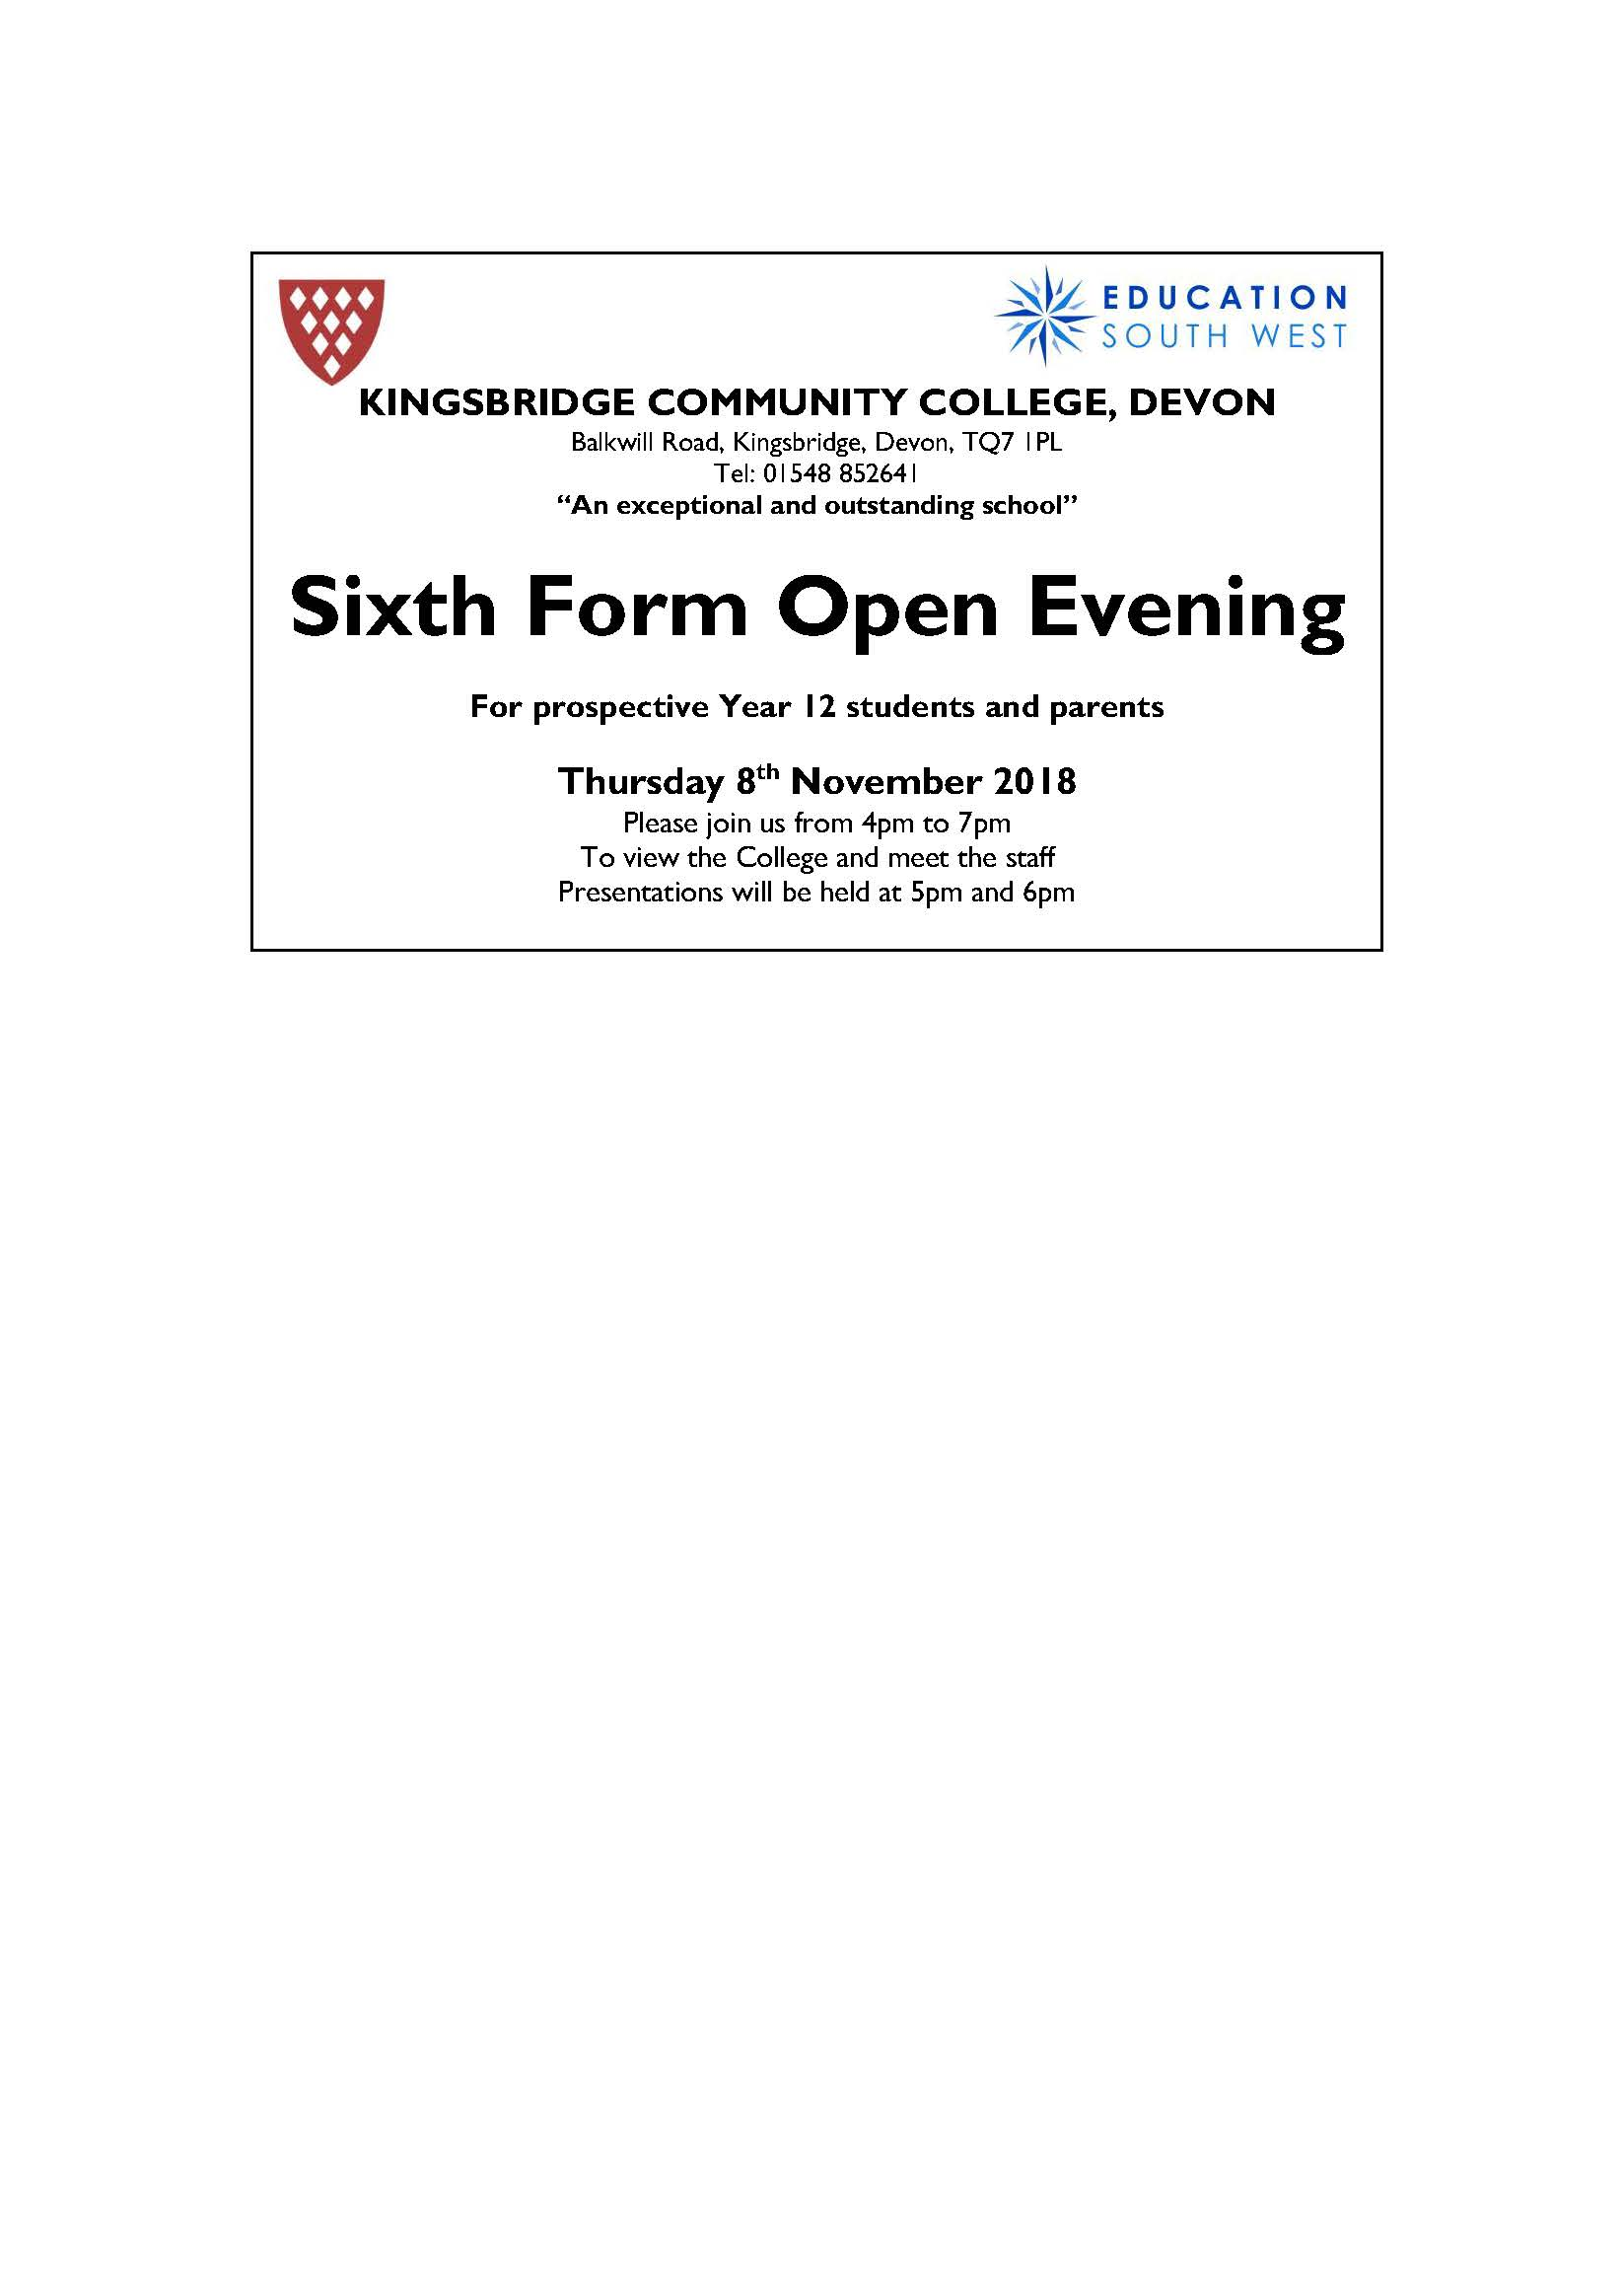 Sixth form open evening oct 2018